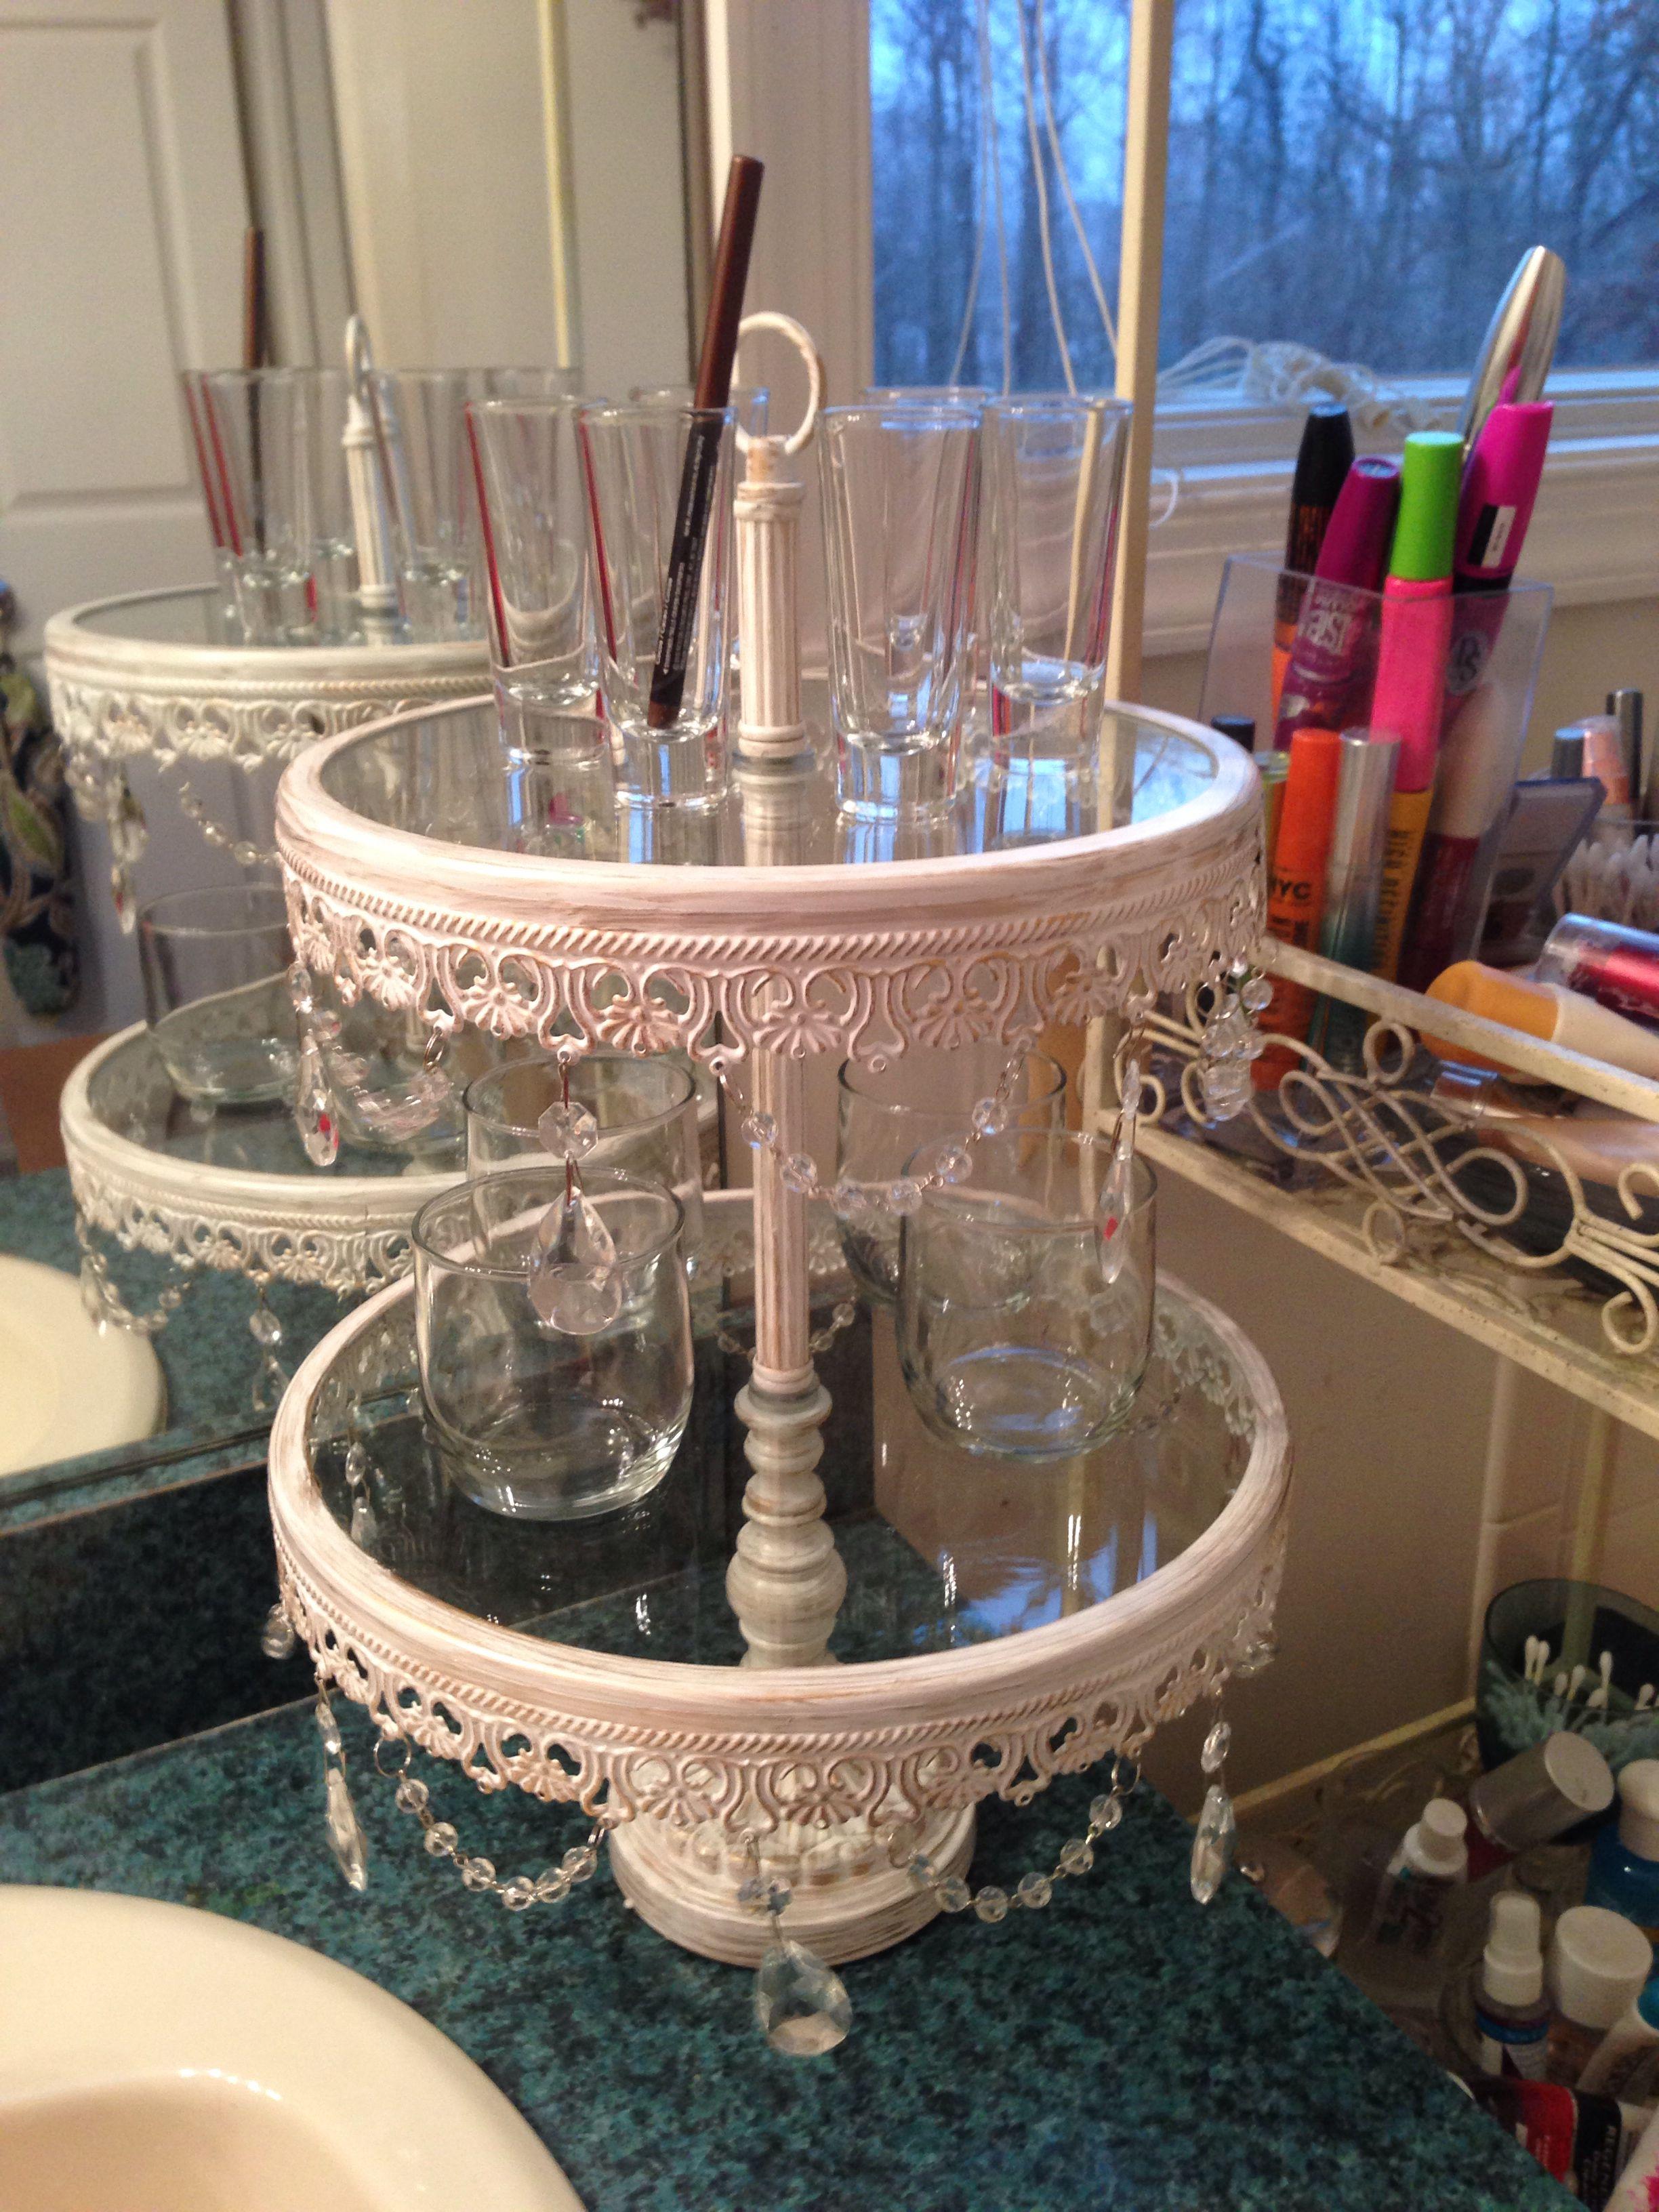 A new idea to beautifully organize your vanity, bathroom